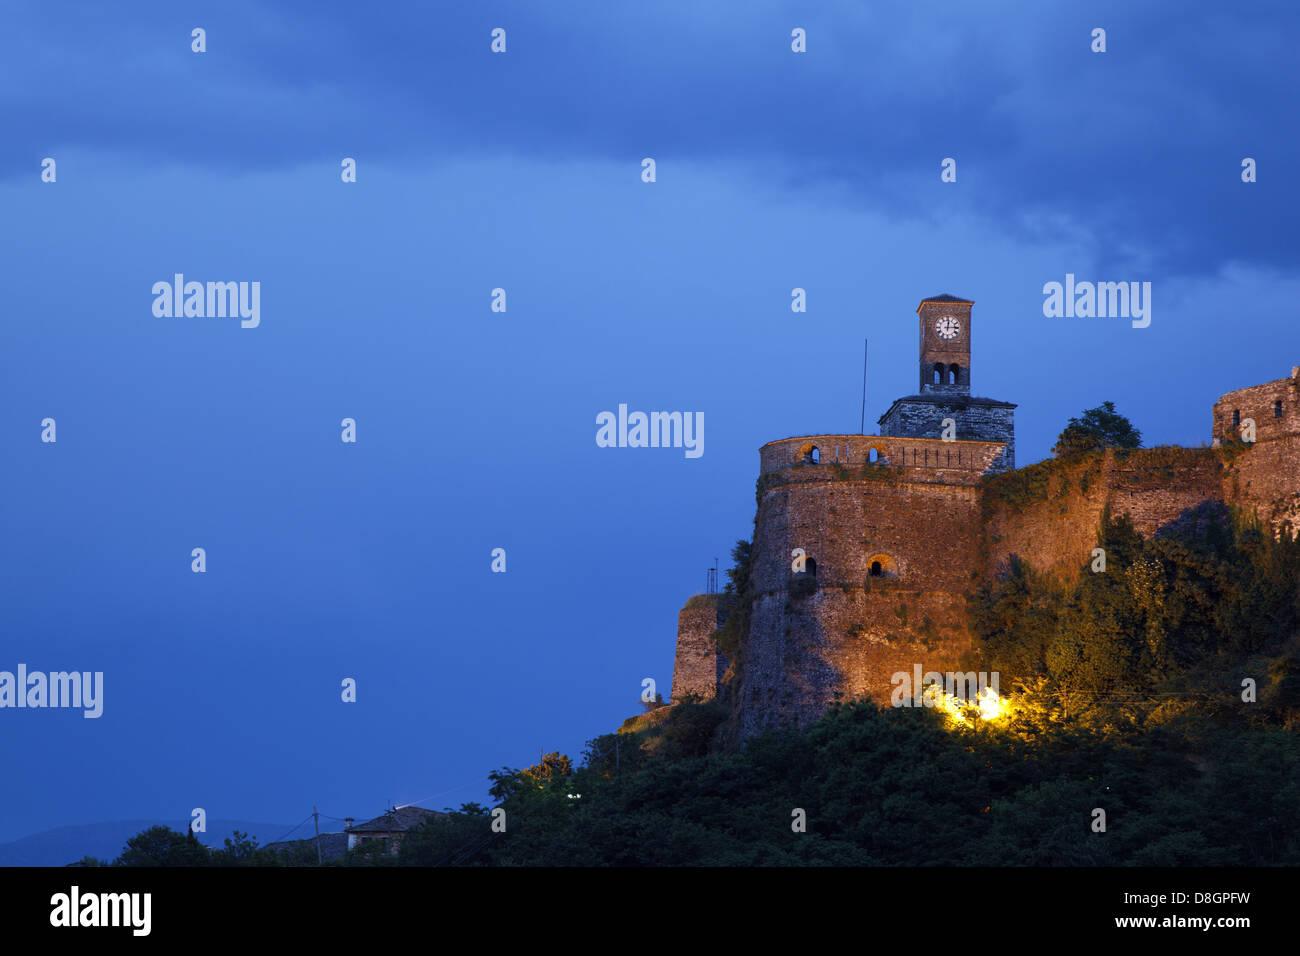 Albania, Gjirokastra, UNESCO; Castle, Gjirokaster, Gjirokastër , Albanien, Gjirokastra, UNESCO Welterbe; Burg - Stock Image